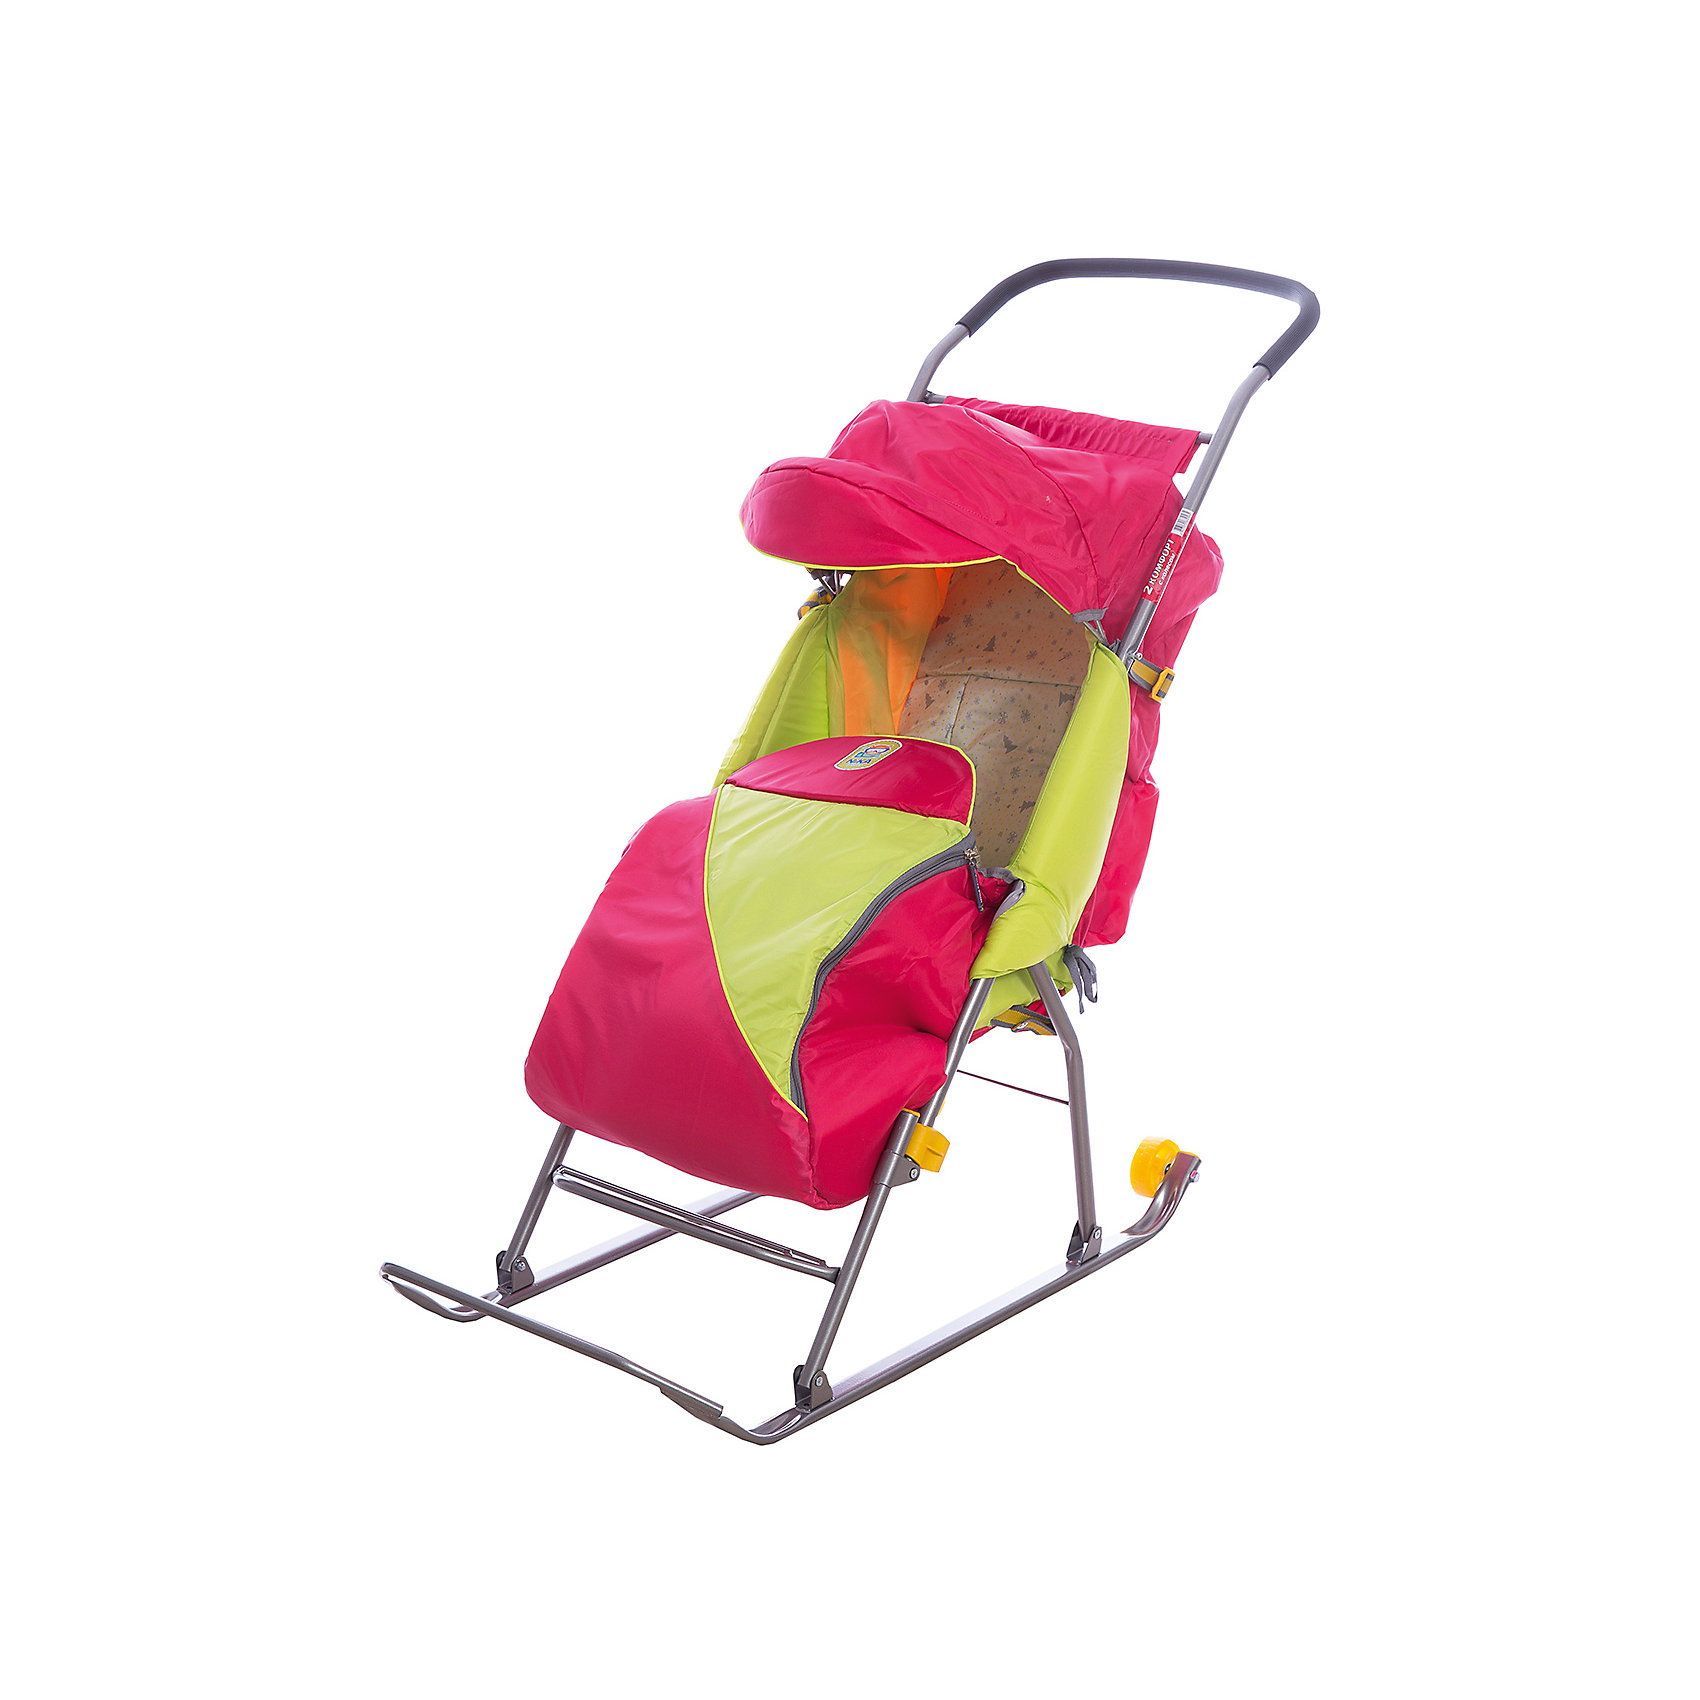 Санки-коляска Тимка 2 Комфорт, малиновый (Ника)